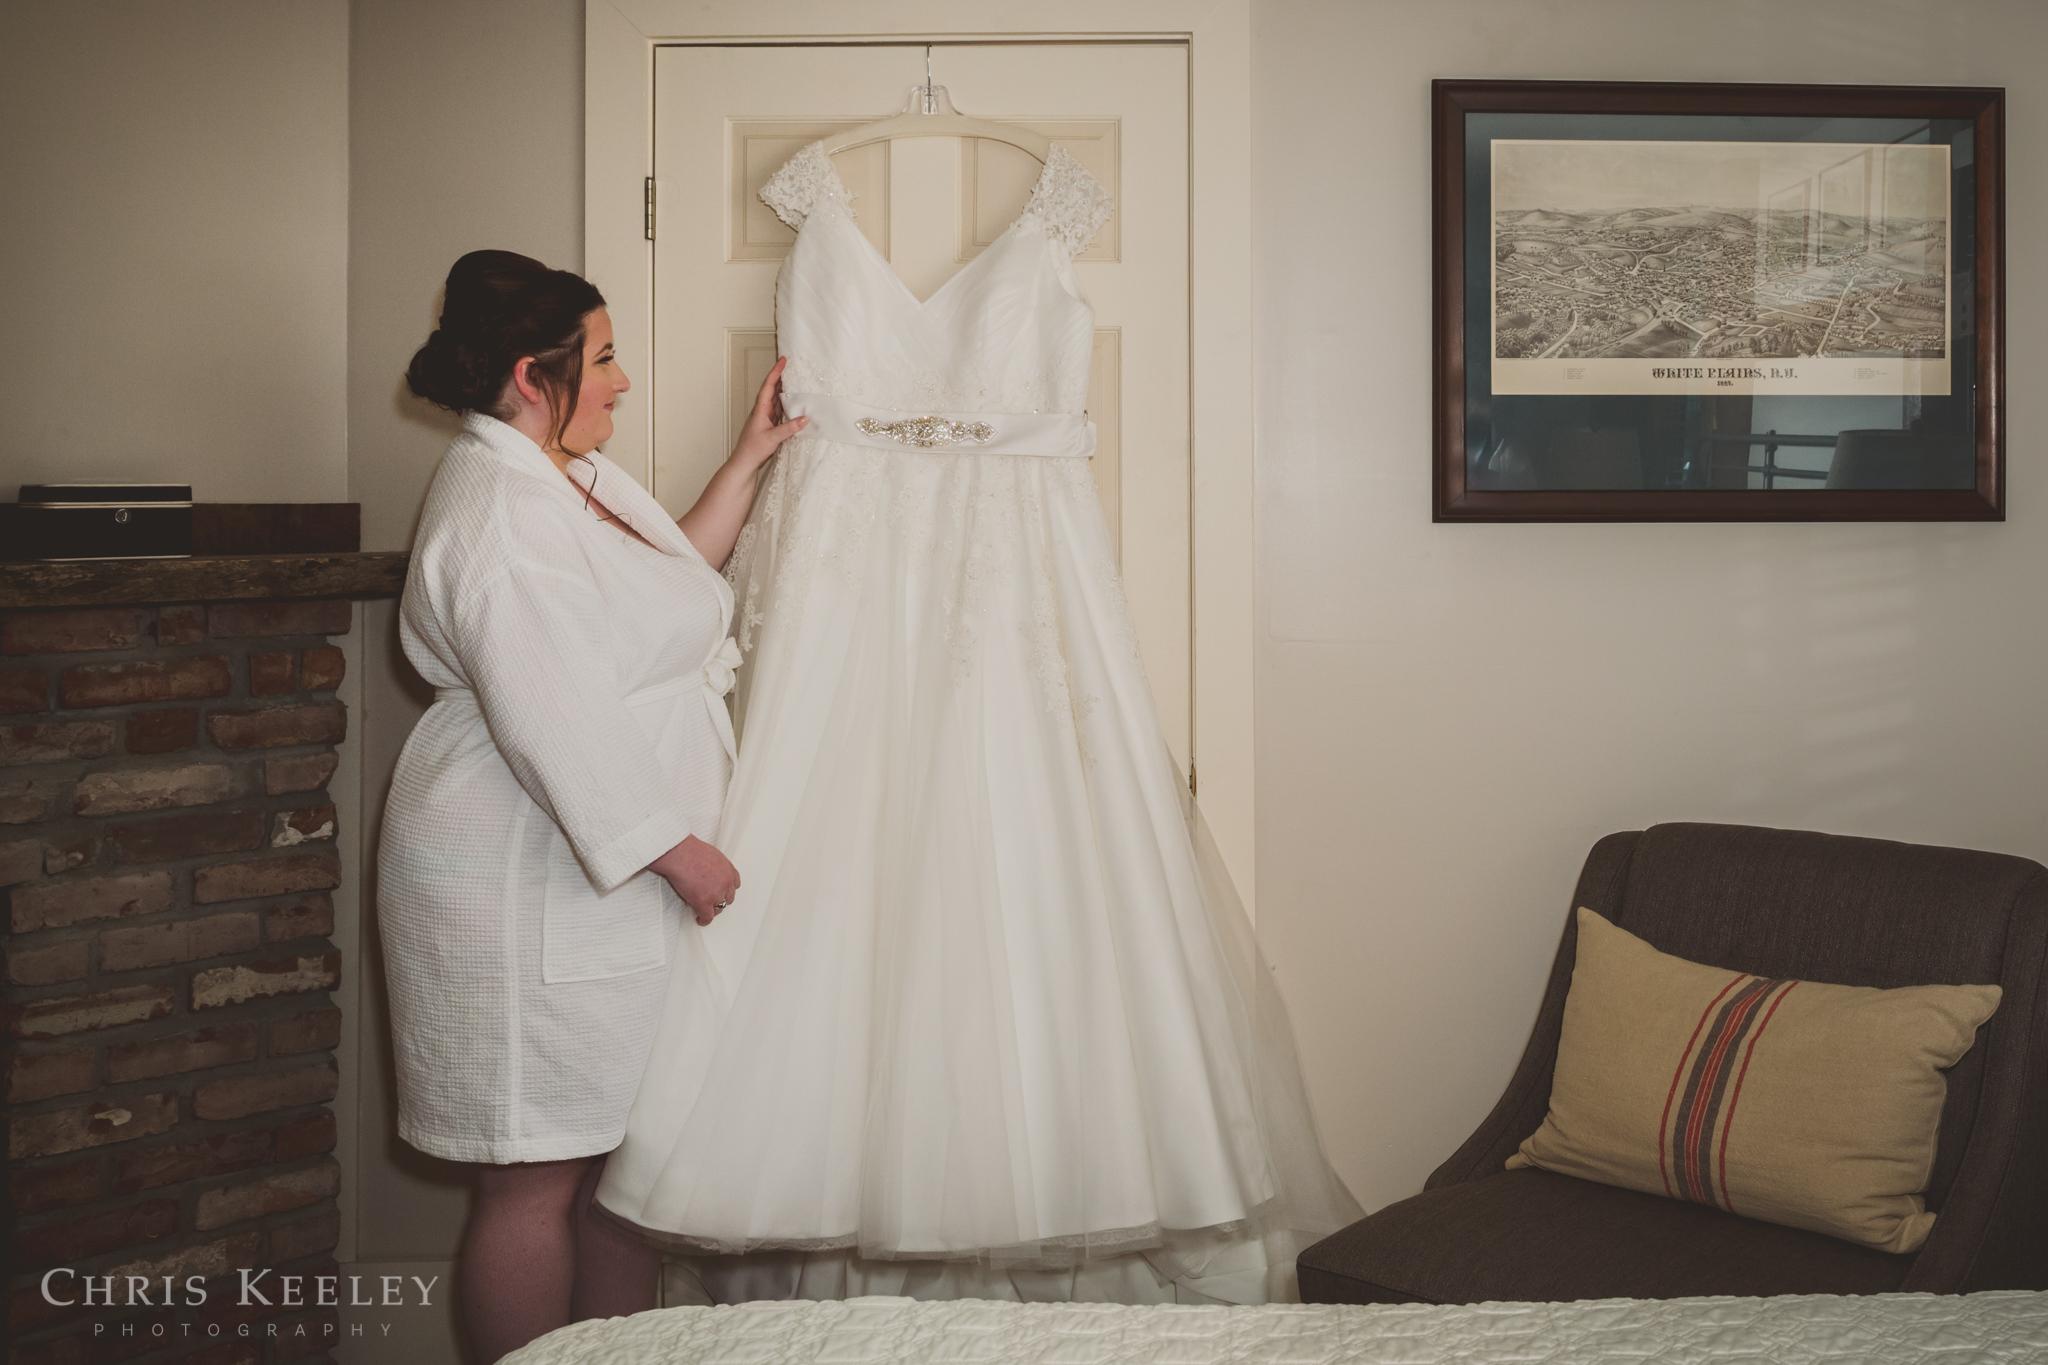 new-hampshire-wedding-photographer-three-chimneys-inn-chris-keeley-photography-07.jpg